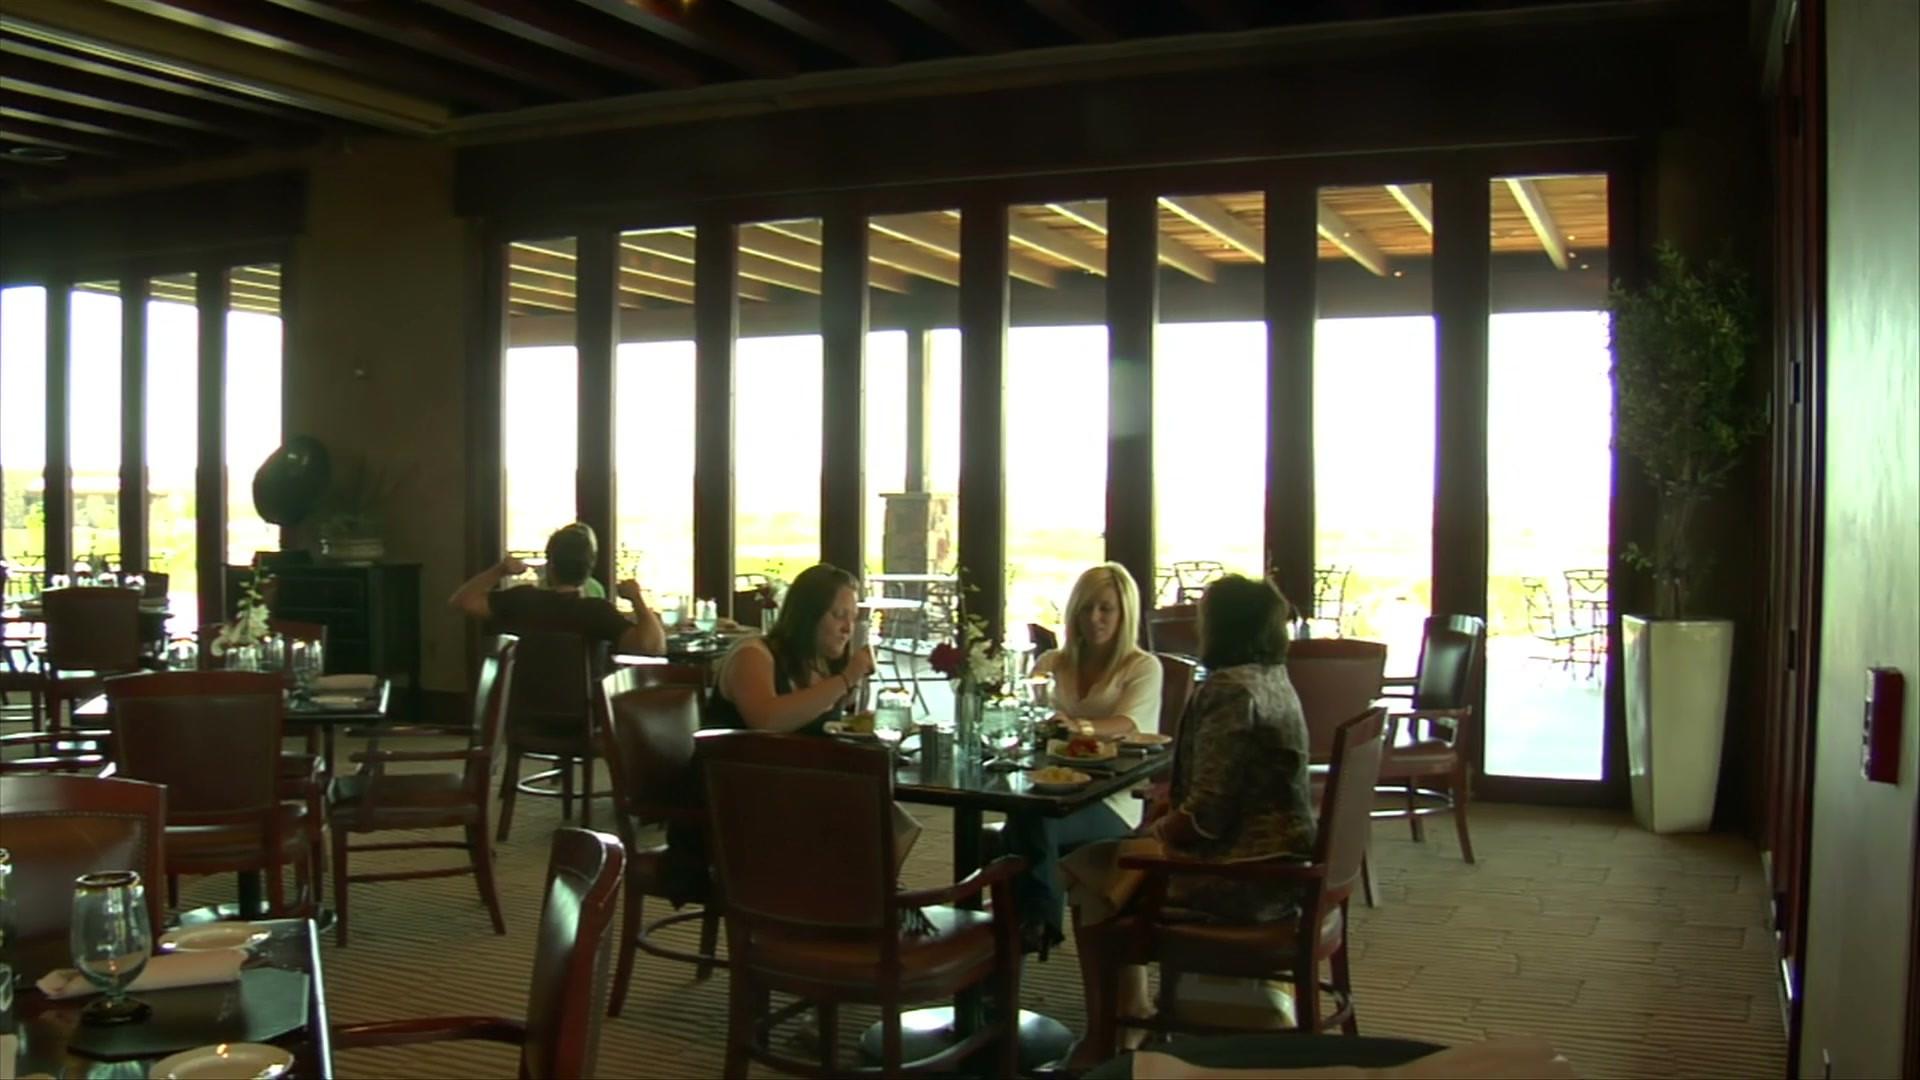 three-ladies-have-lunch-in-restaurant-wi